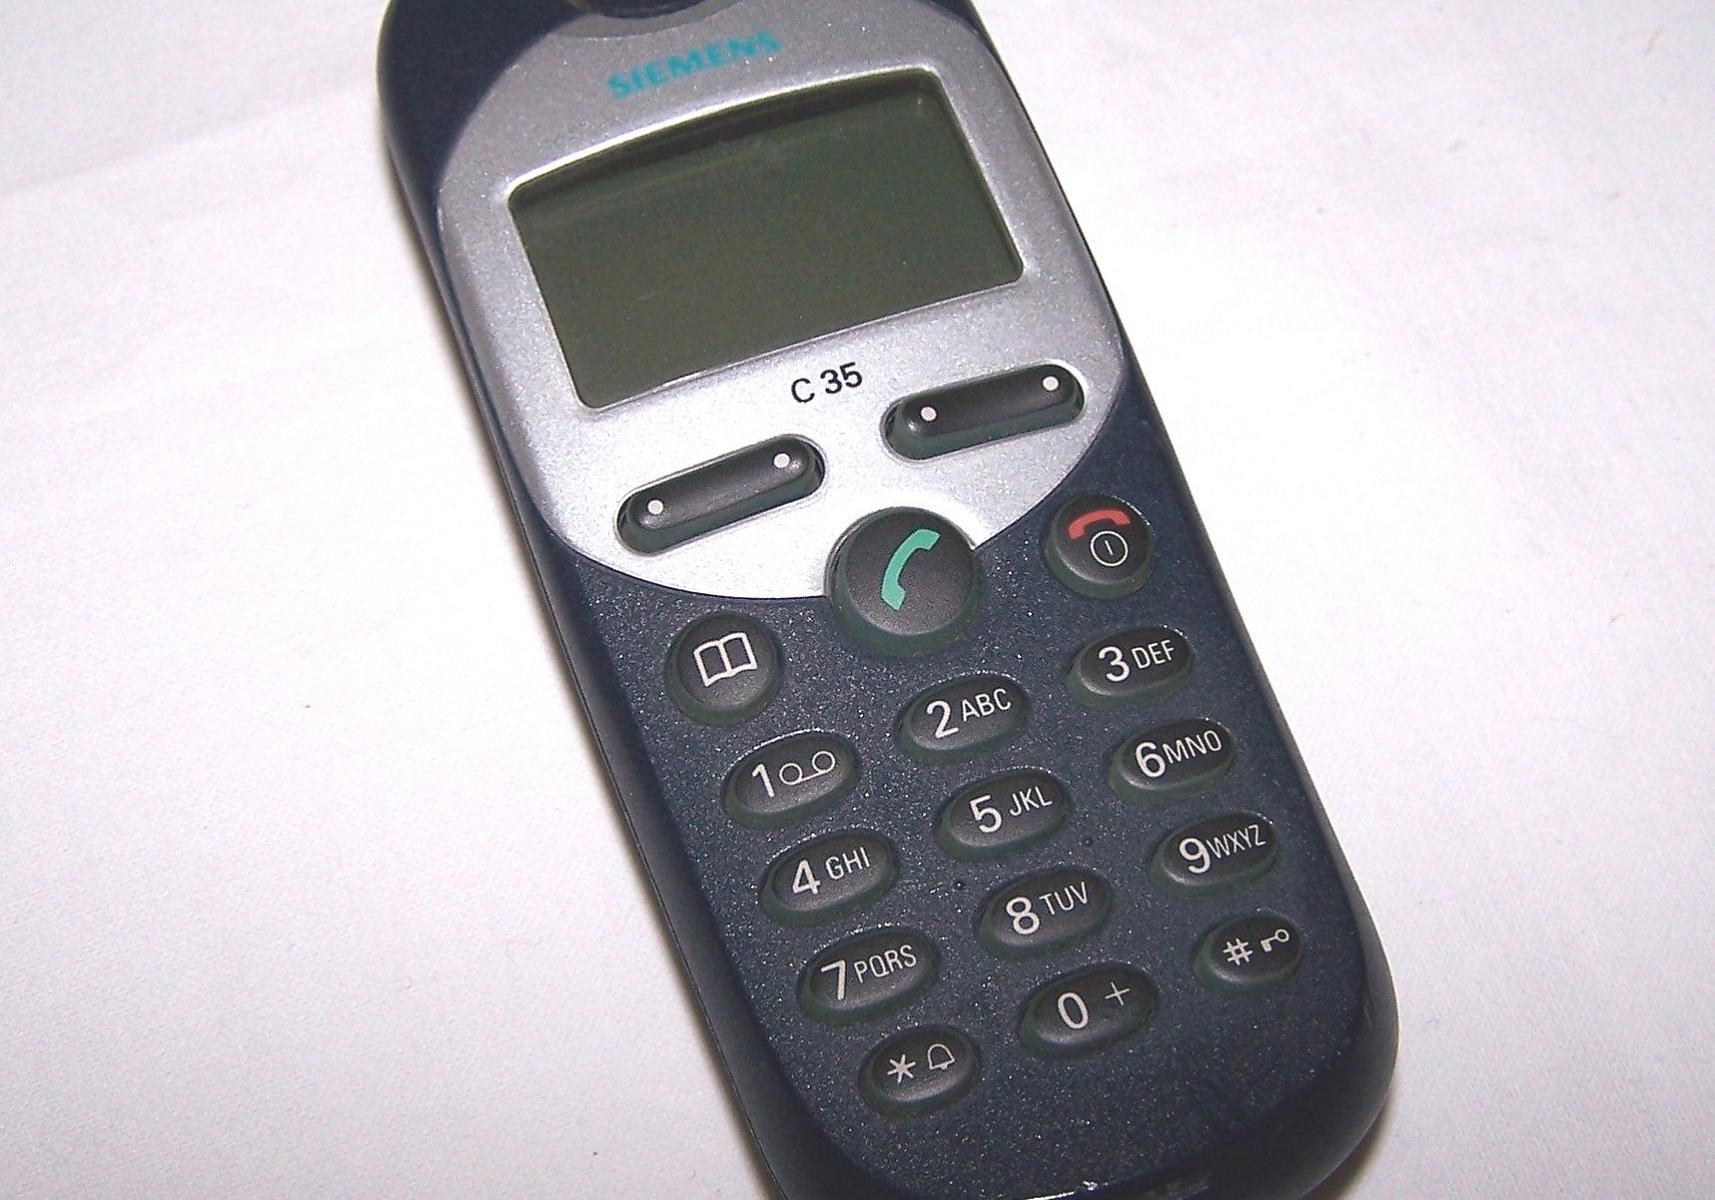 Büro - IT & Kommuniaktion - Mobiltelefon Siemens C35